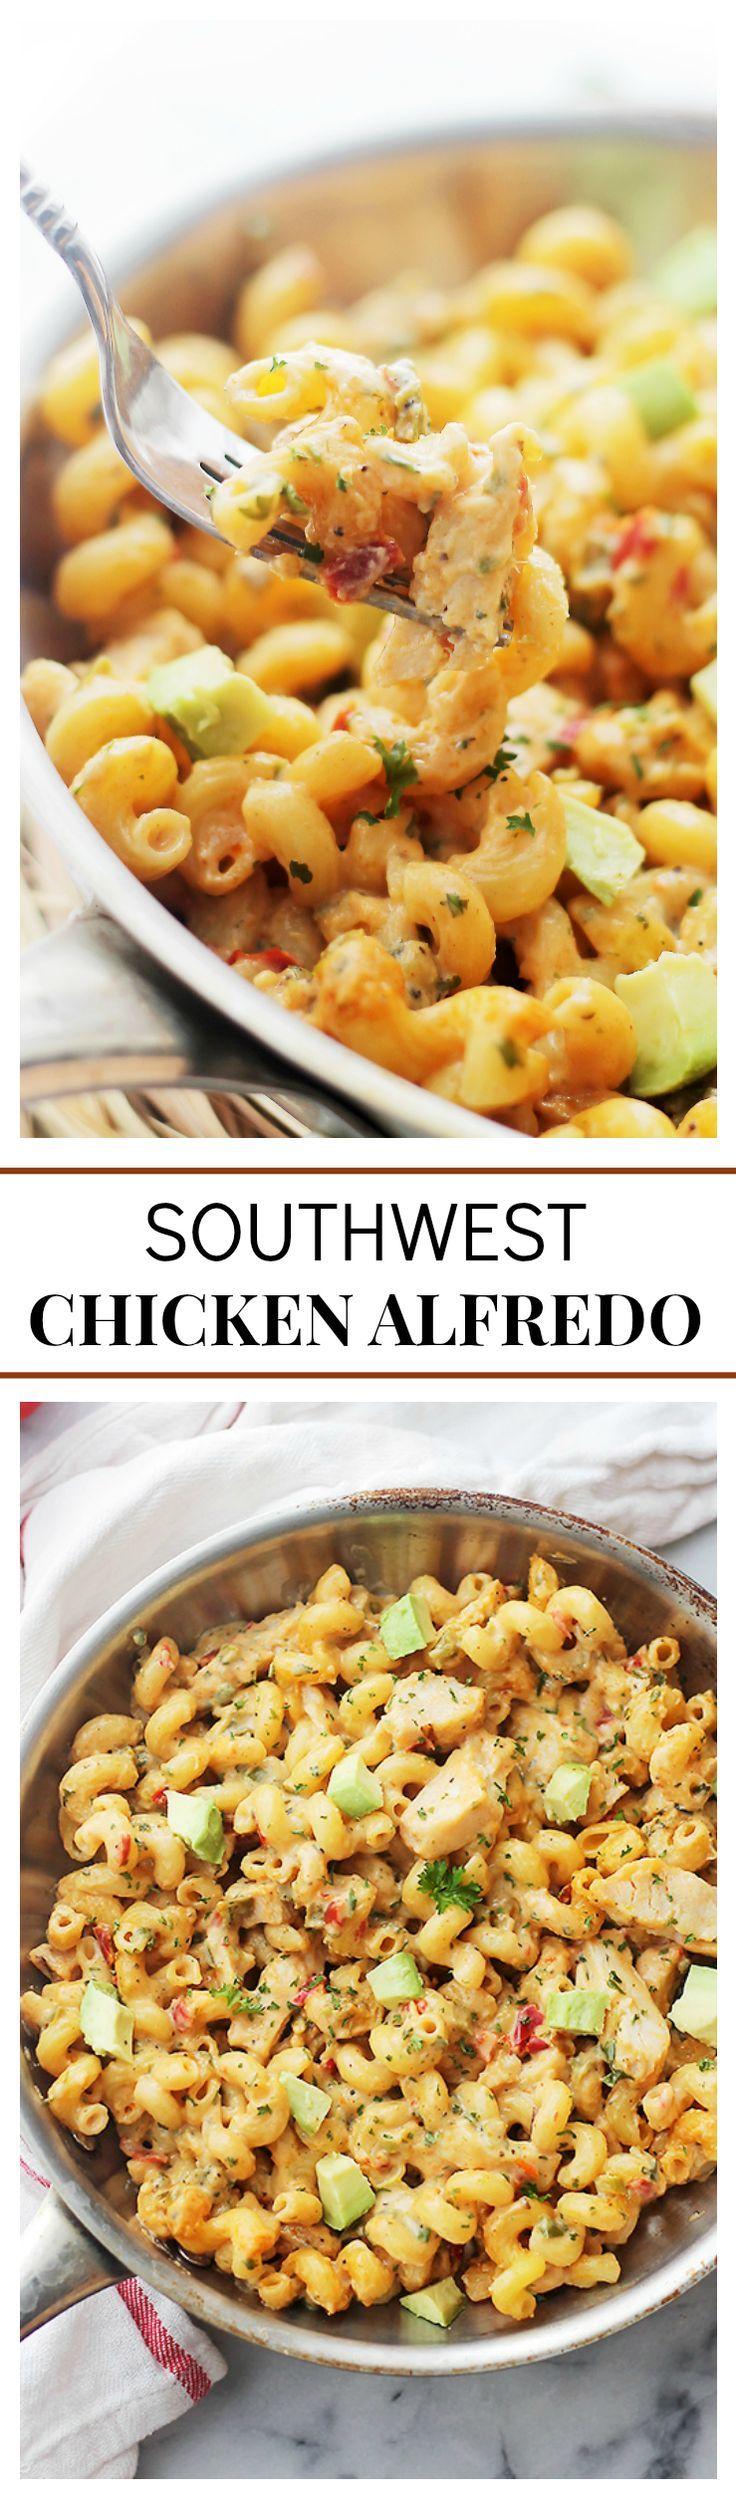 Southwest Chicken Alfredo   www.diethood.com   Easy, creamy and delicious pasta dish with spicy chicken, veggies, homemade alfredo sauce and cavatappi pasta. SO darn good!!